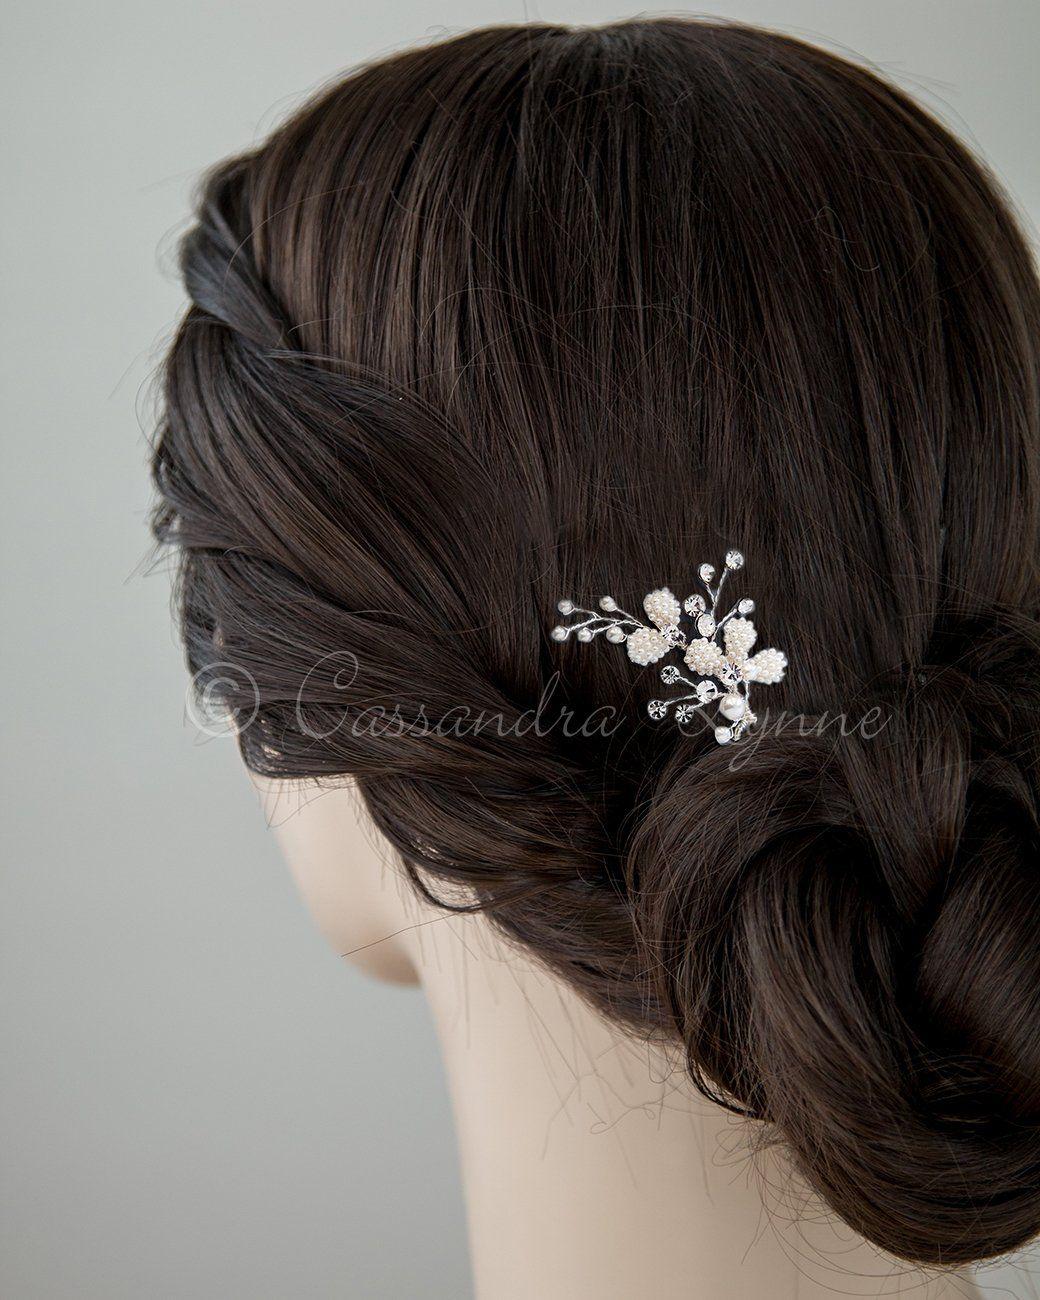 Ivory Pearl Wedding Hair Pin in Hair styles Pinterest